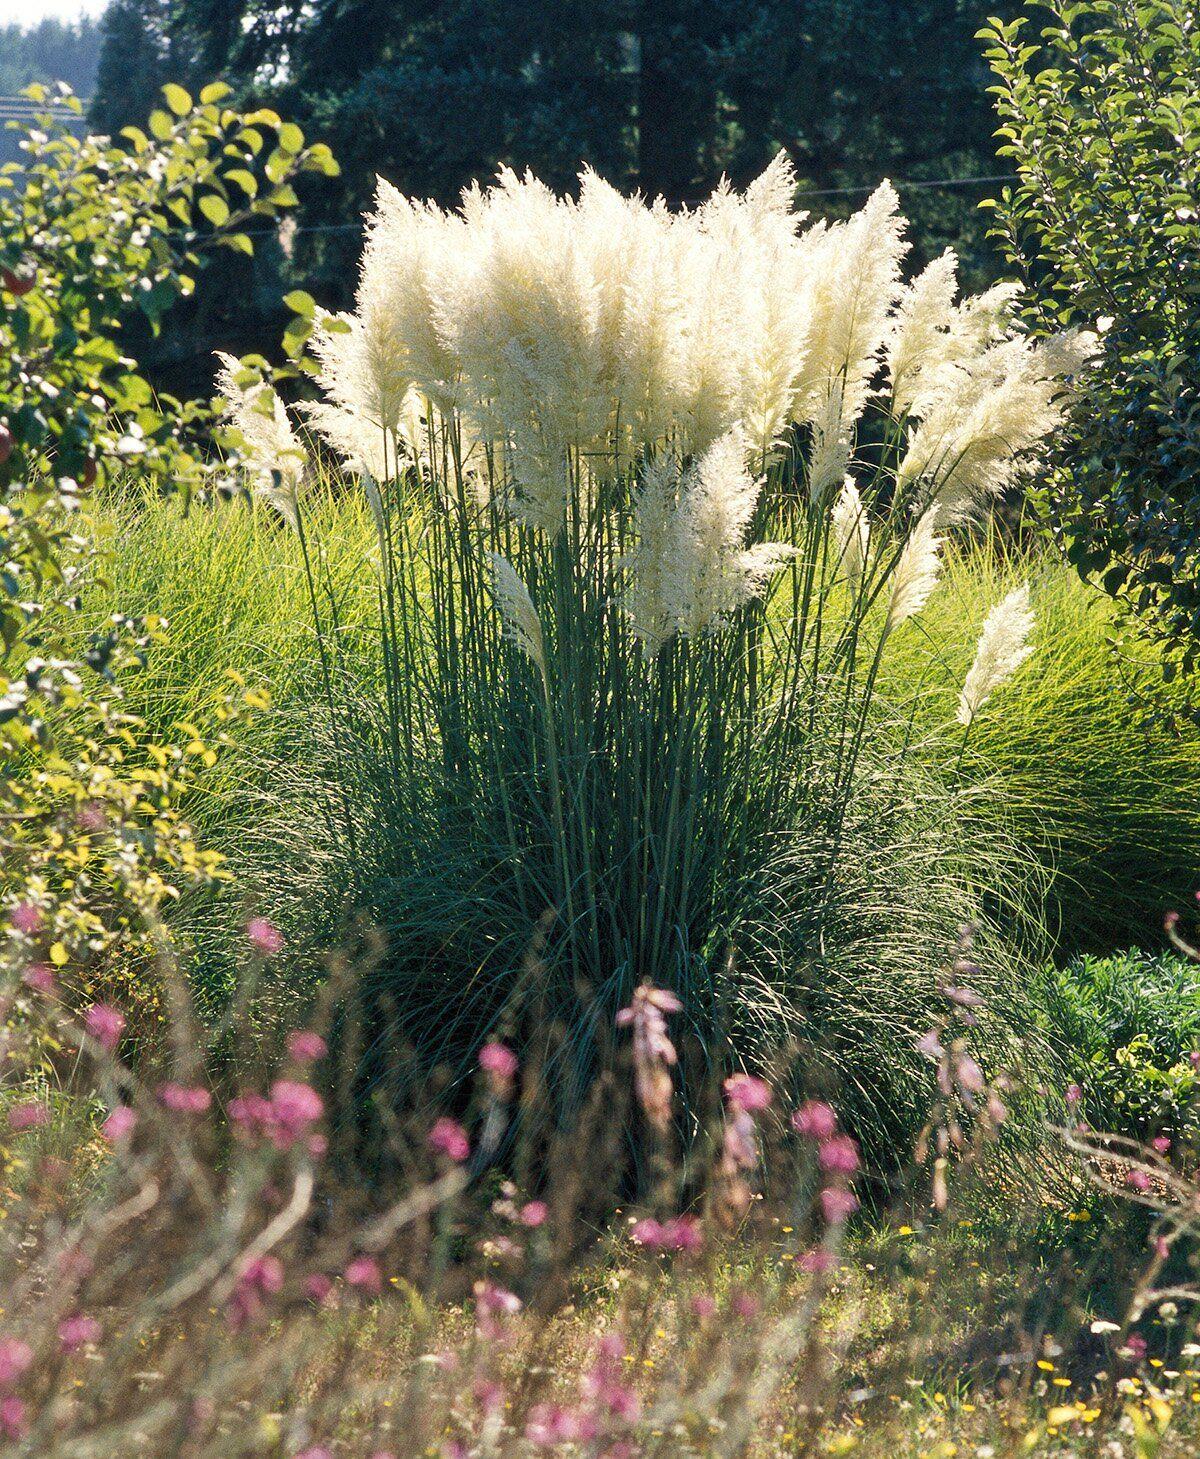 Dwarf Pampasgrass In 2020 Ornamental Grasses Grasses Landscaping Grasses Garden